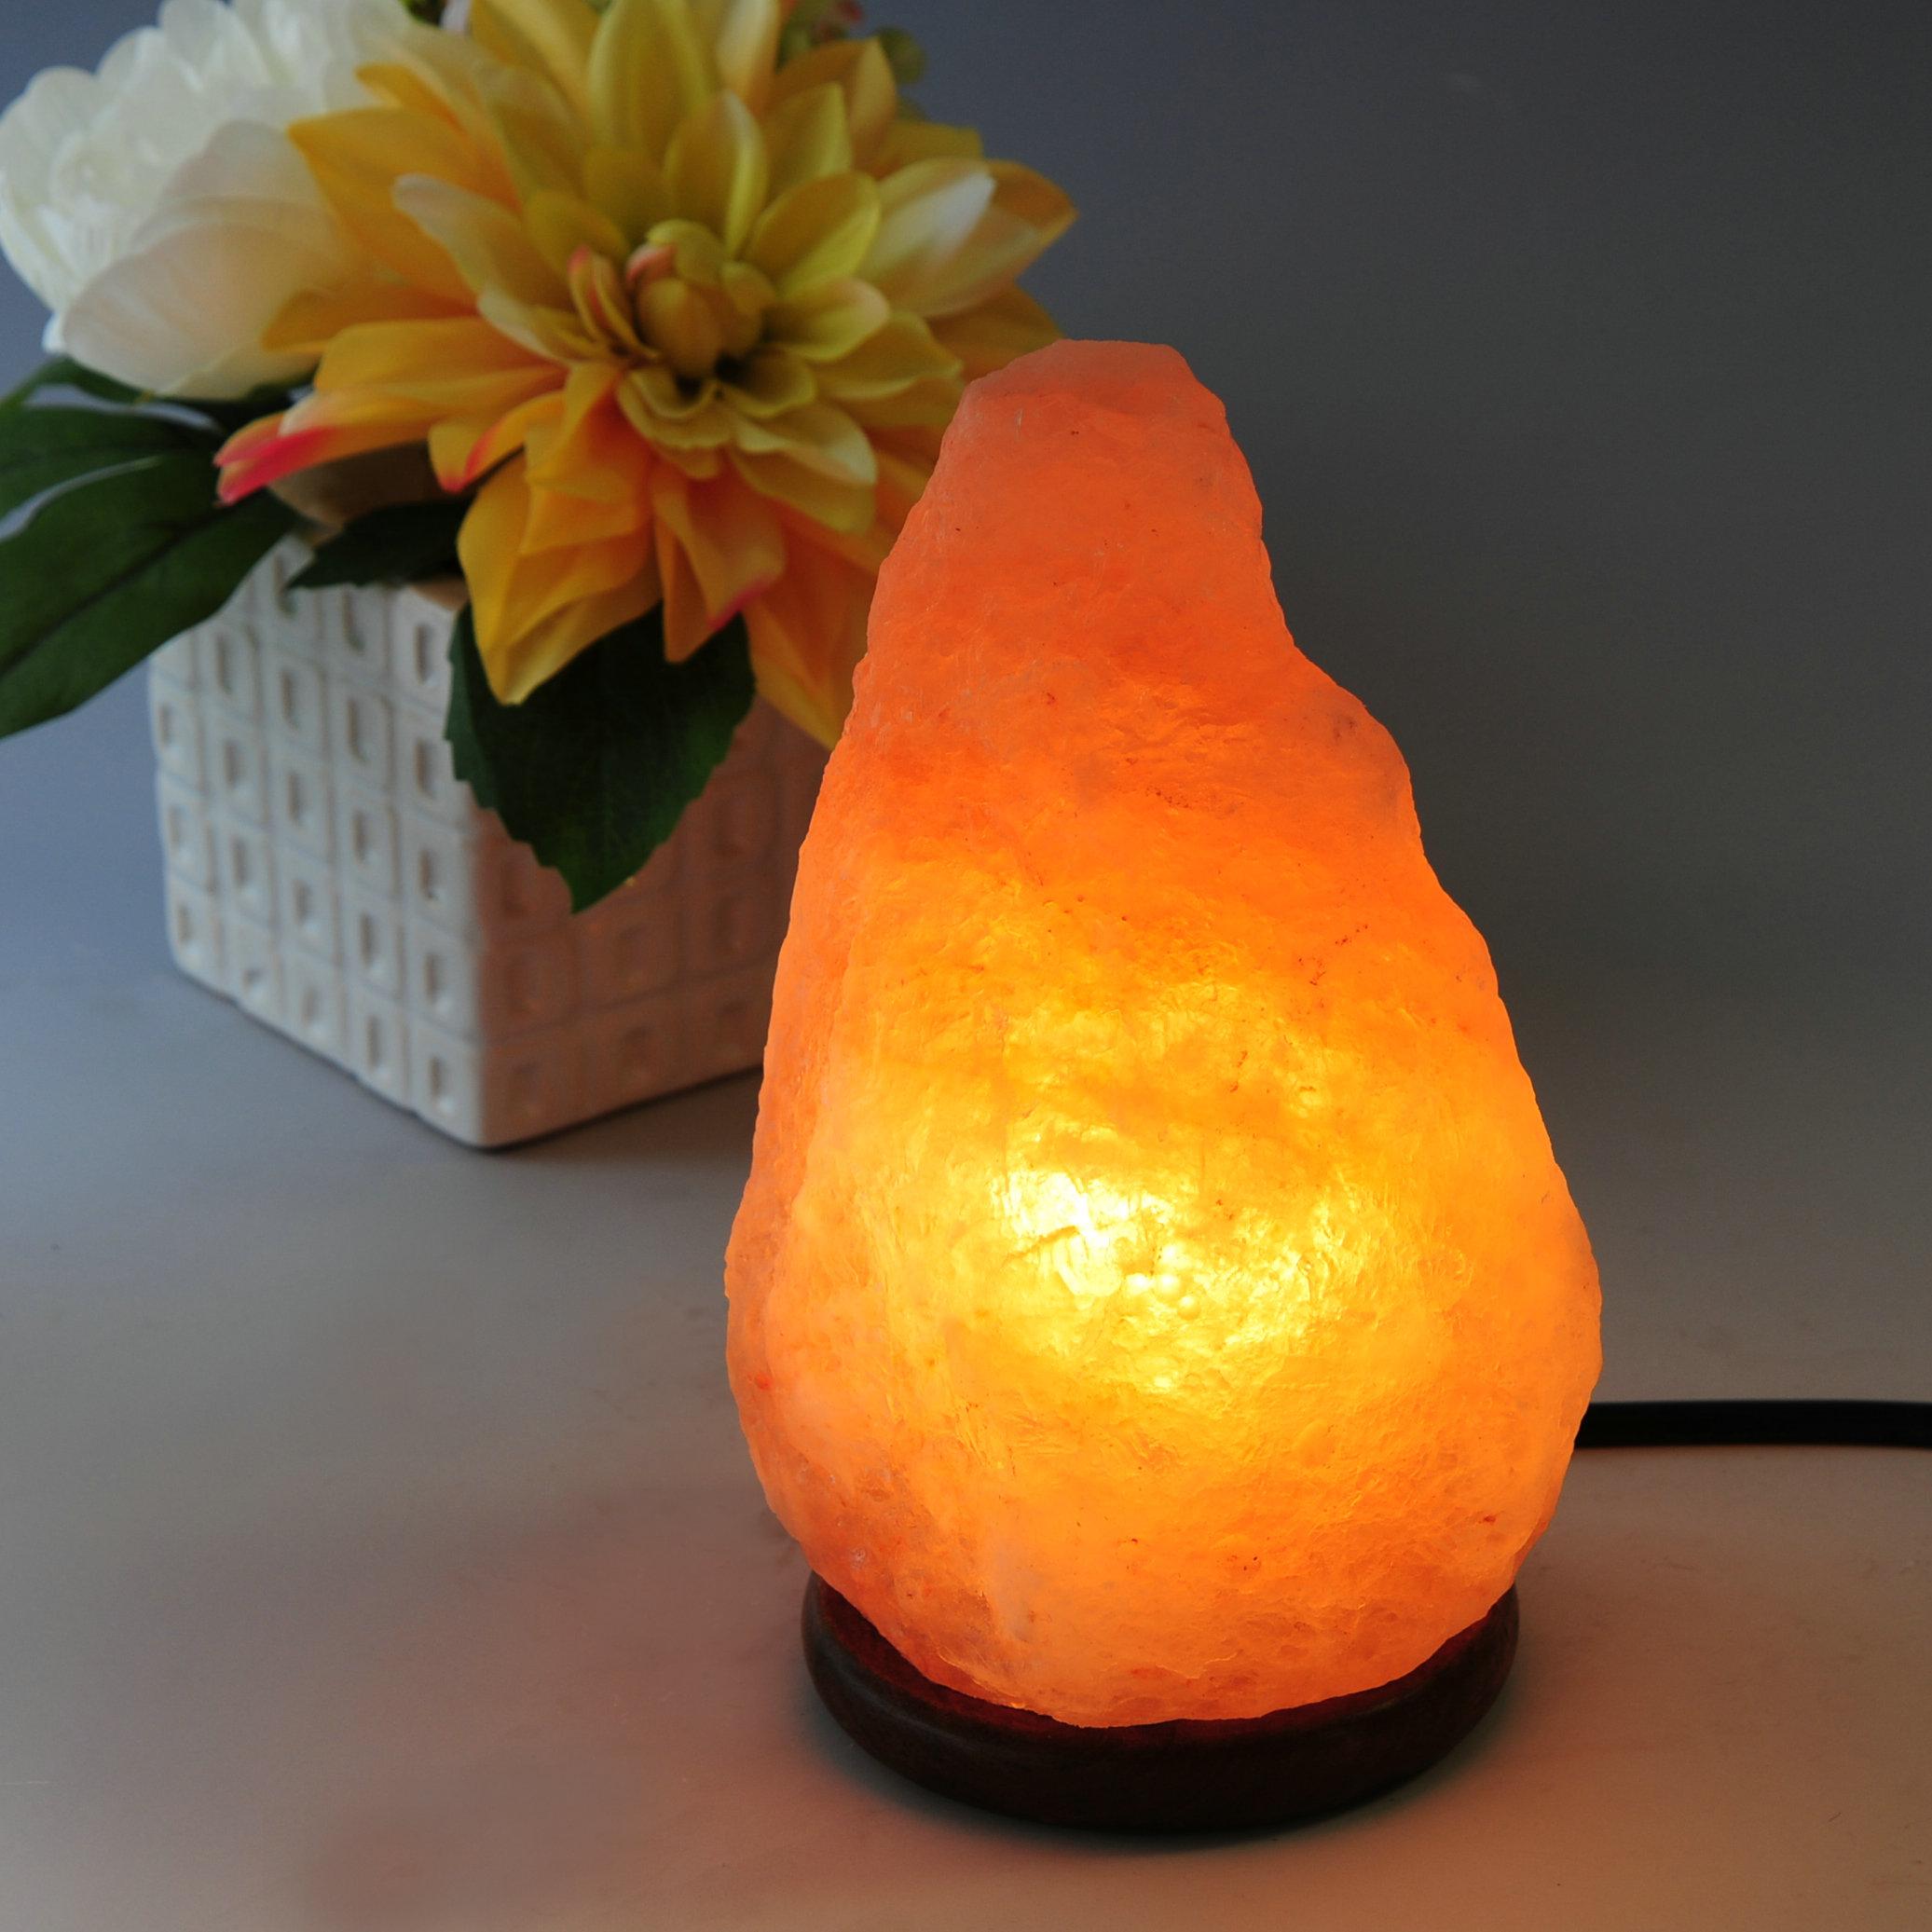 "JIC Gem 4.5-6.5LB, Around 8"" Natural Shape Himalayan Salt Lamp SL01, with Dimmer Cord"